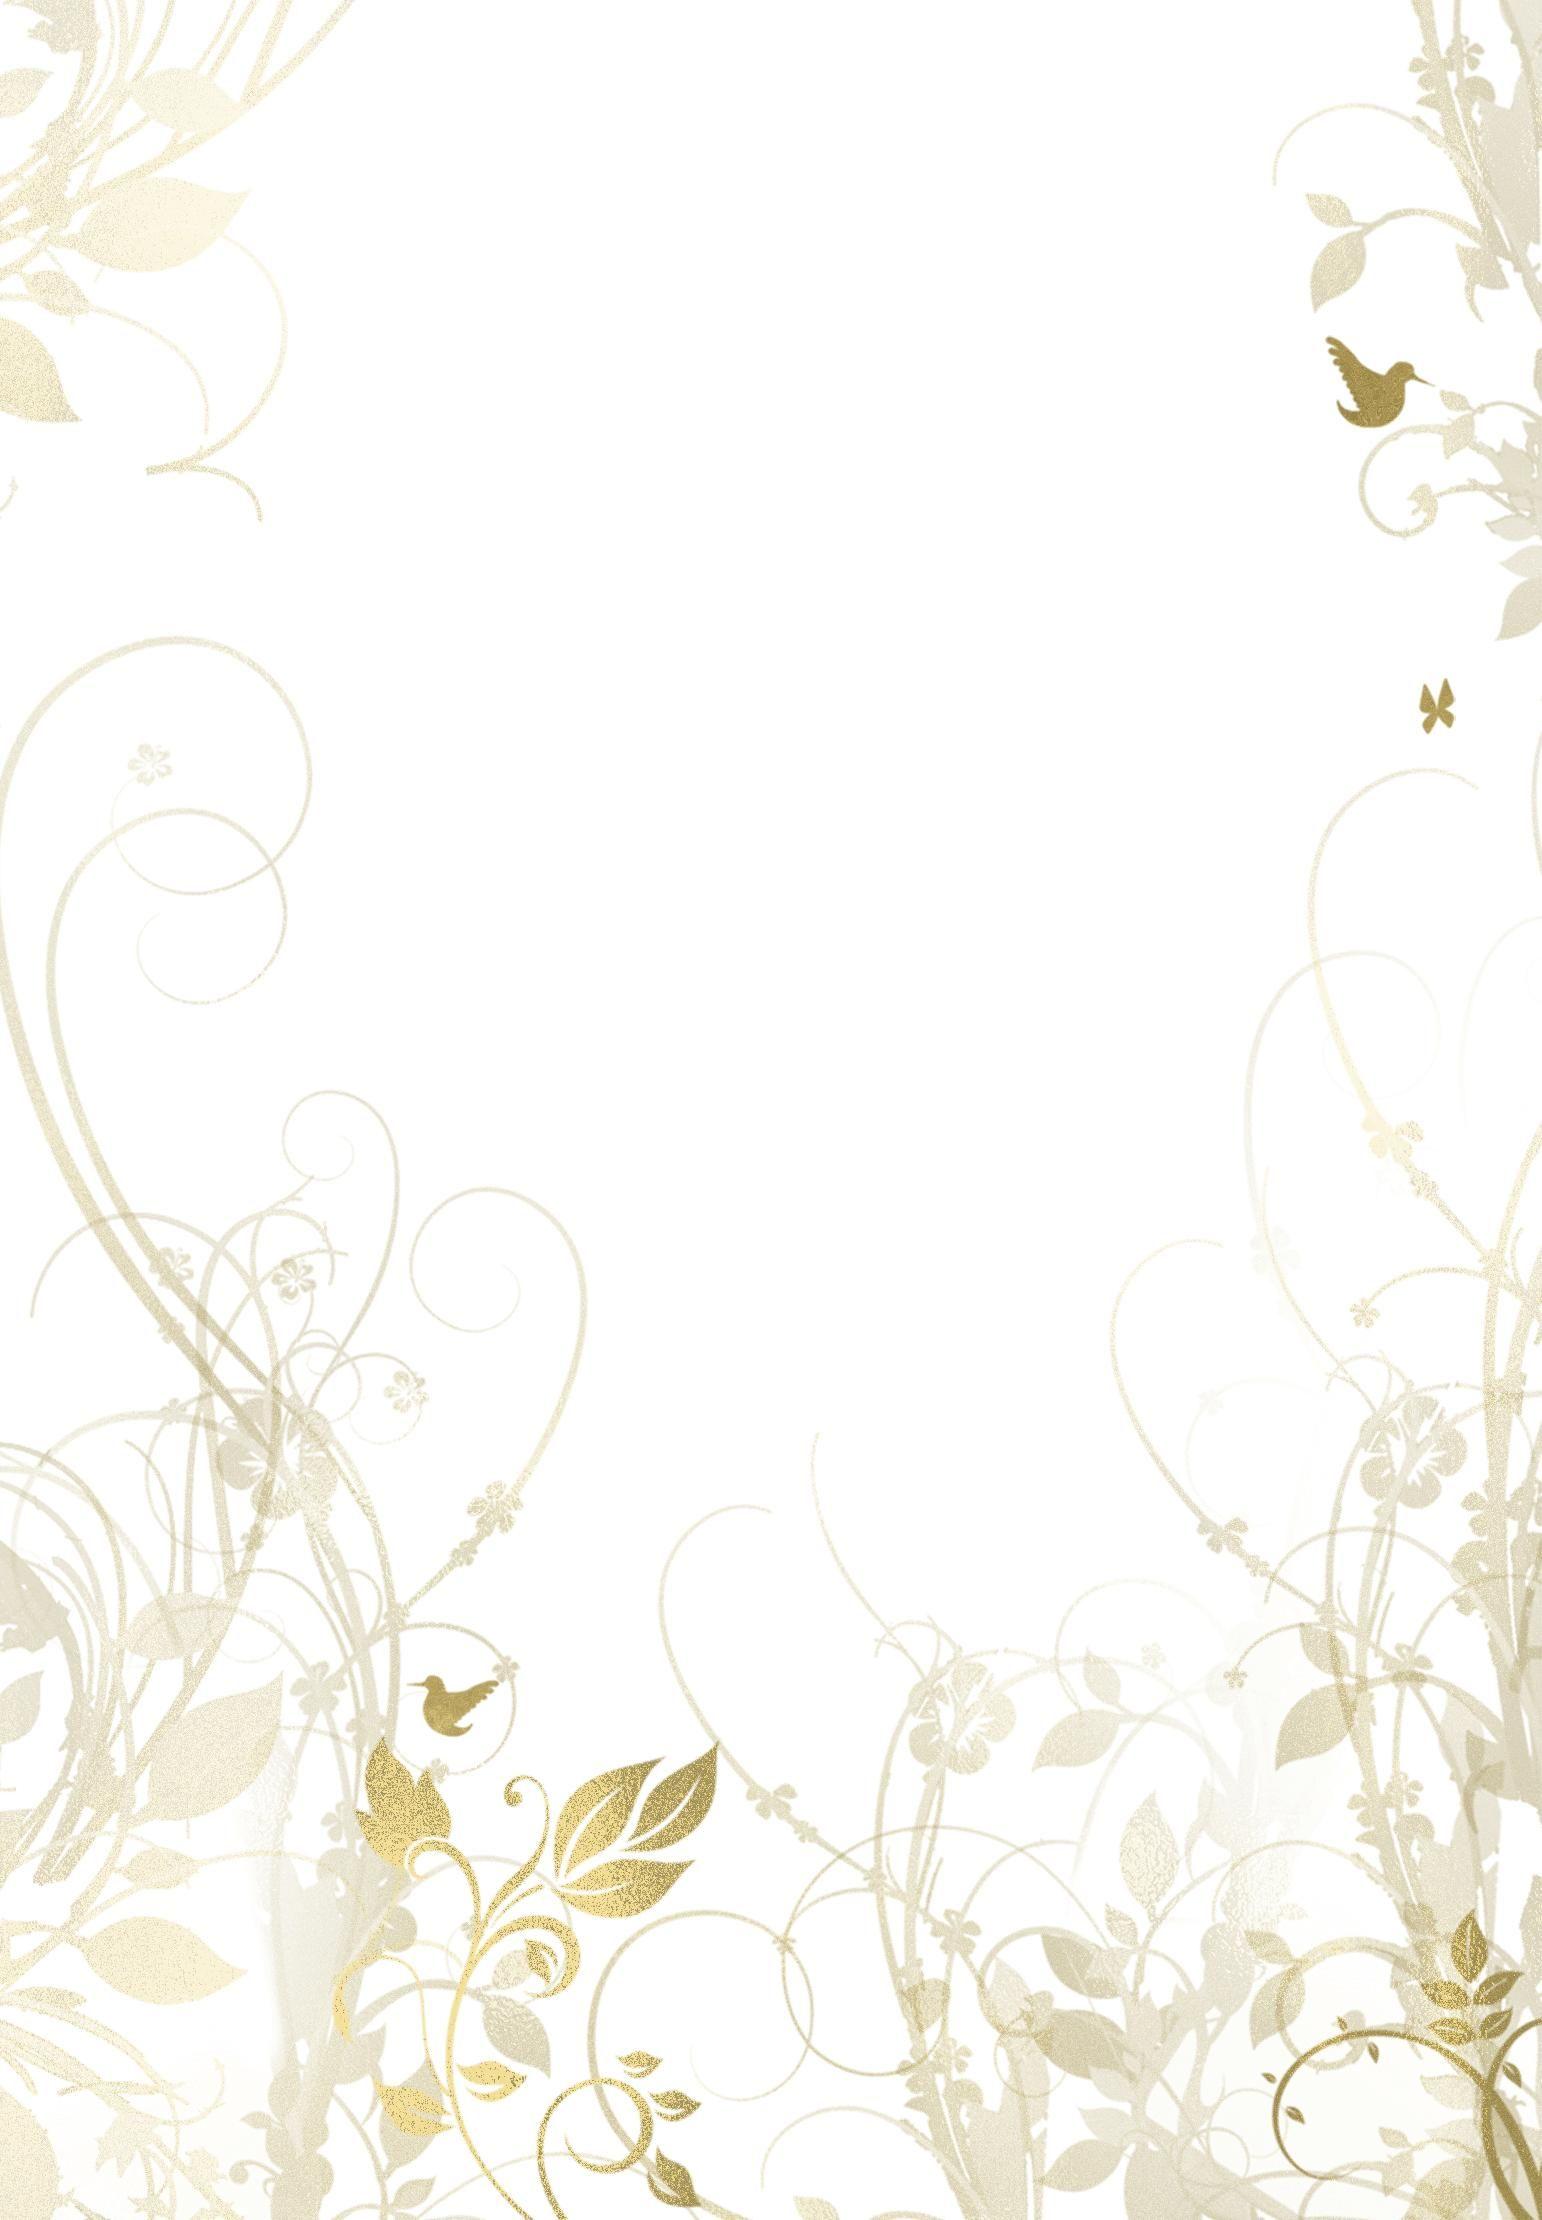 51 Wedding Invitation Template Blank in 2020 | Wedding invitations  printable templates, Blank wedding invitations, Blank wedding invitation  templates